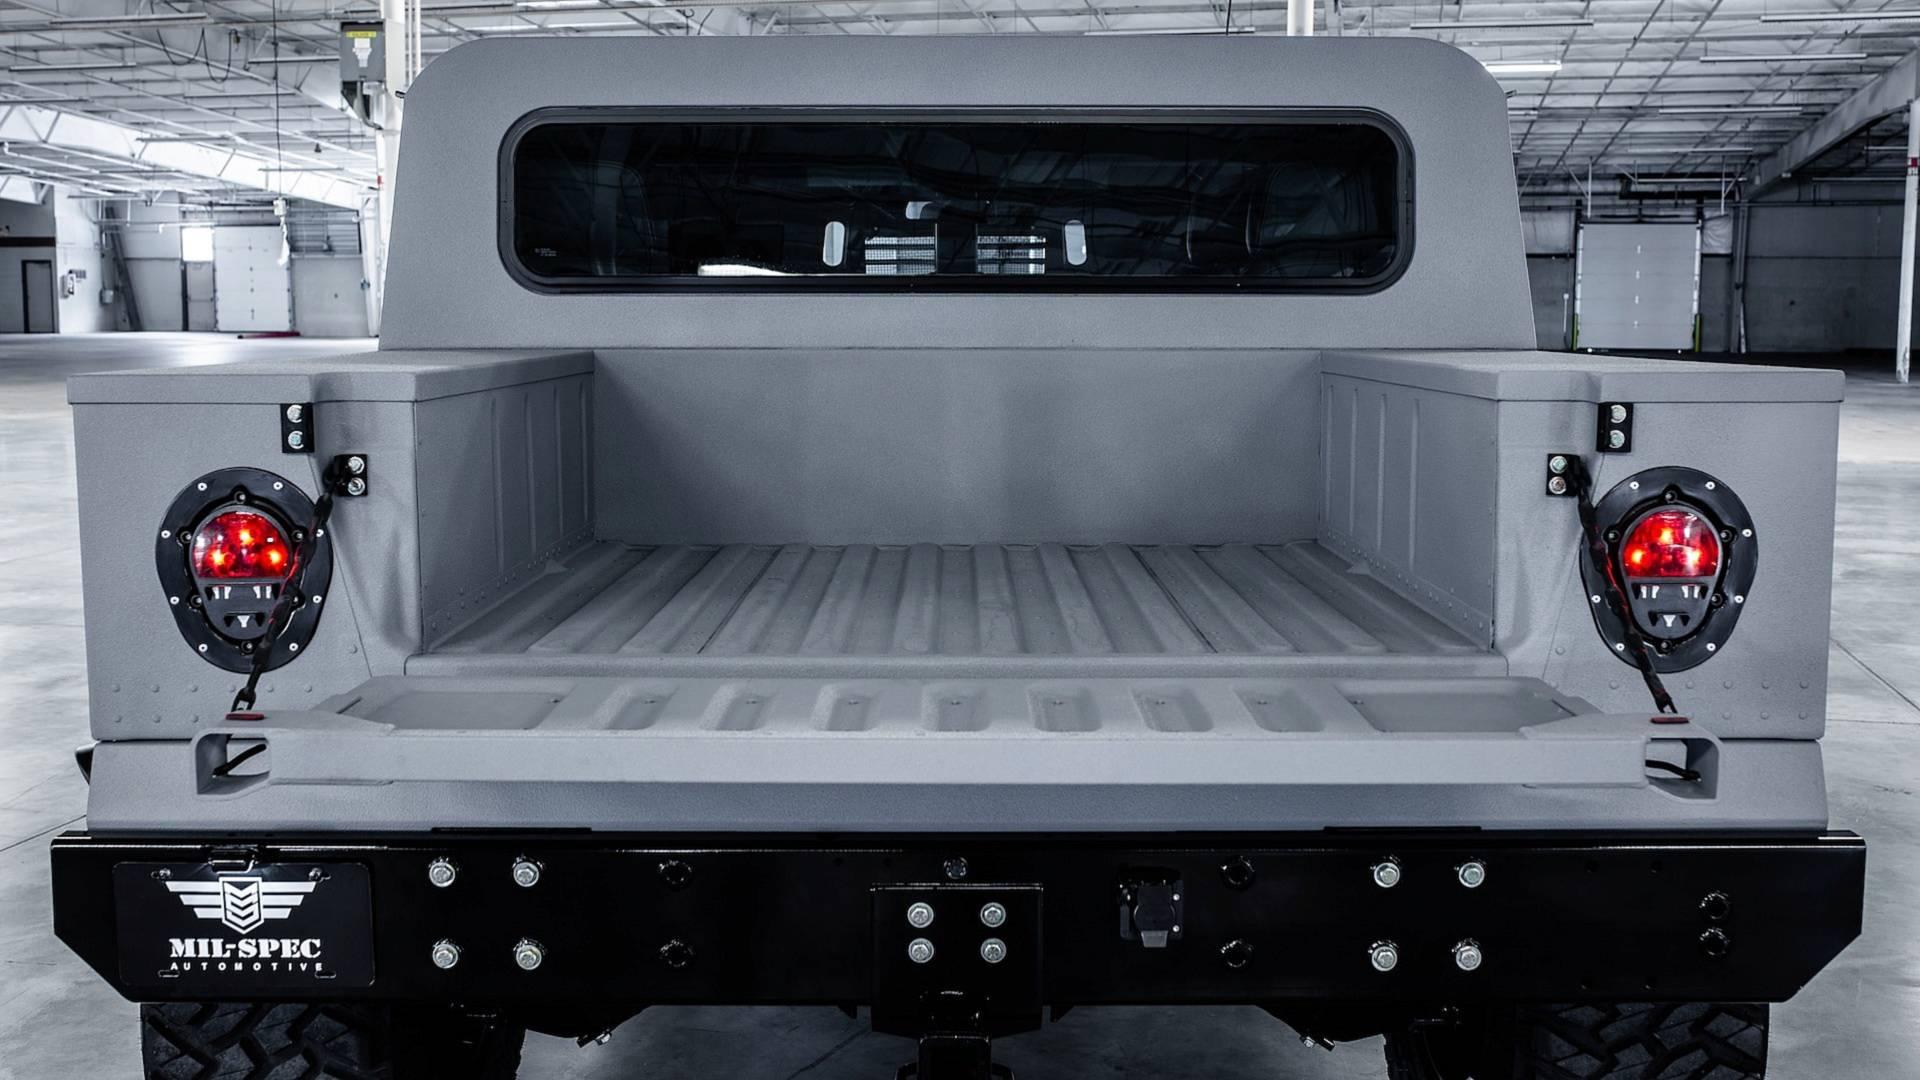 mil-spec-automotive-hummer-m1 (8)